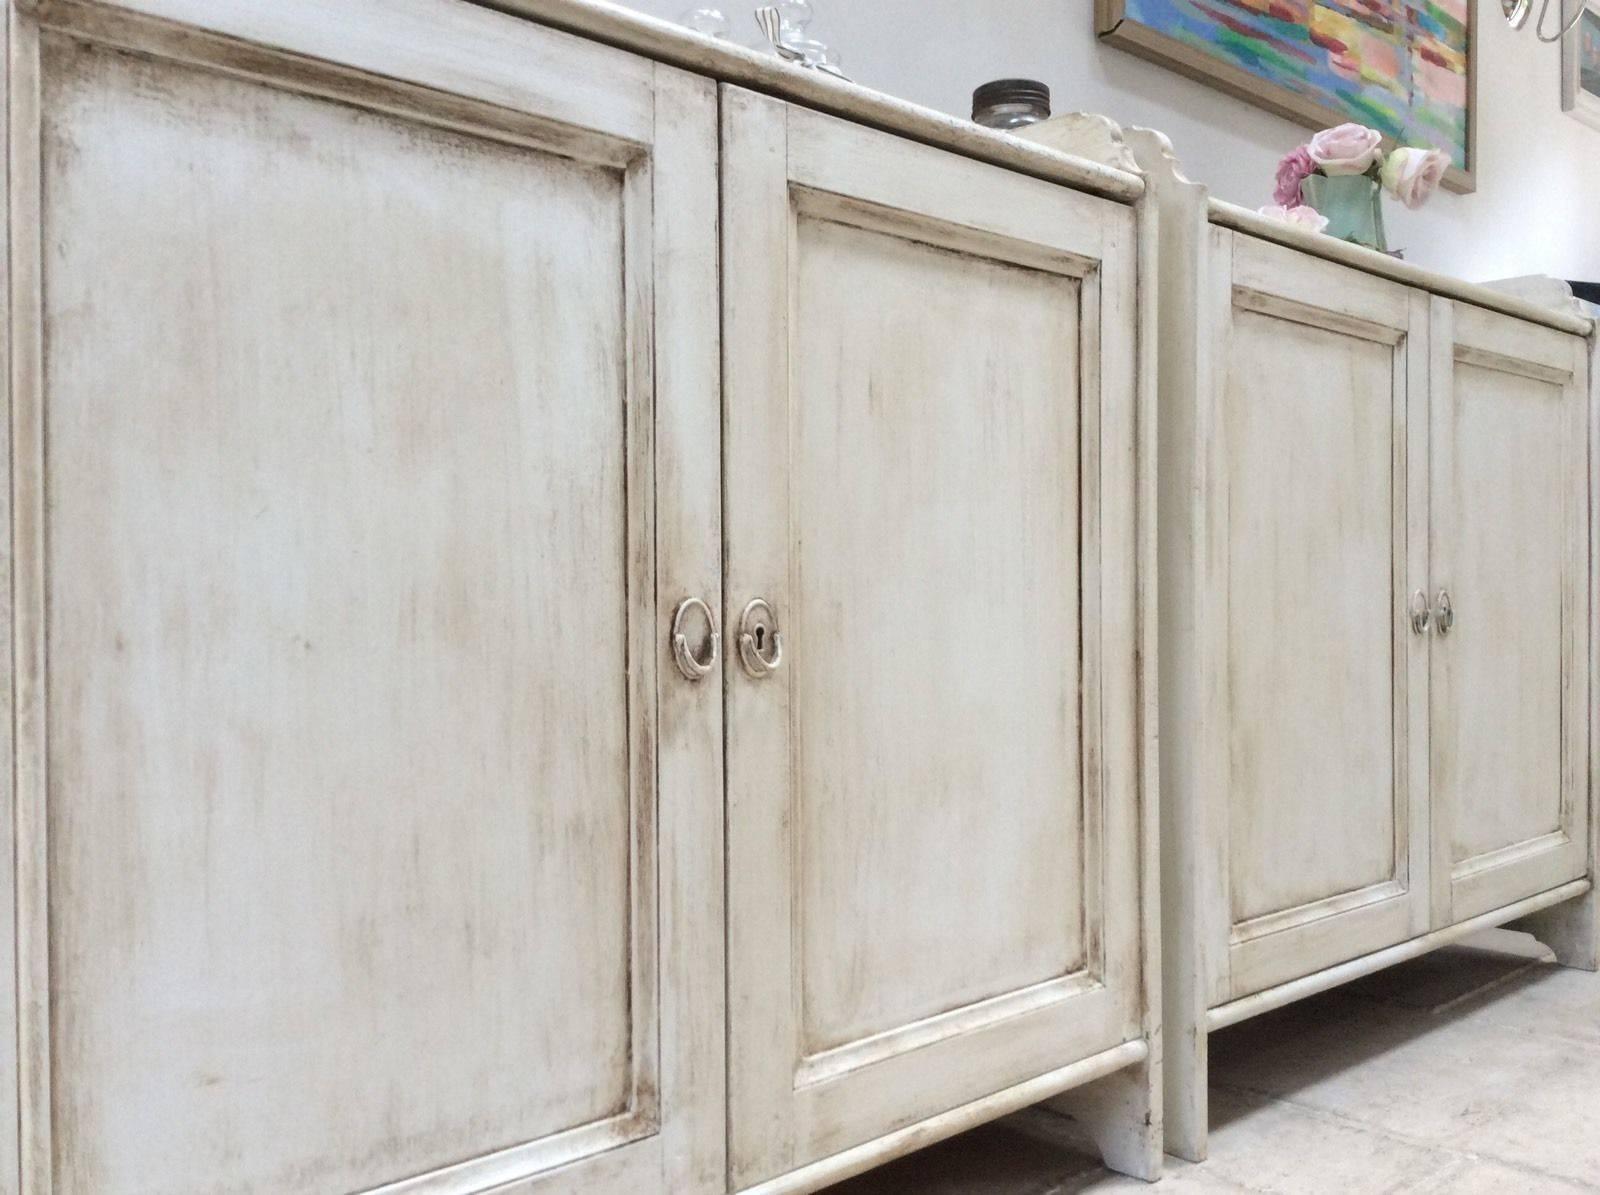 Of Pine Painted Cream Sideboard Freestanding Kitchen Unit Cupboard For Free Standing Kitchen Sideboards (#9 of 15)